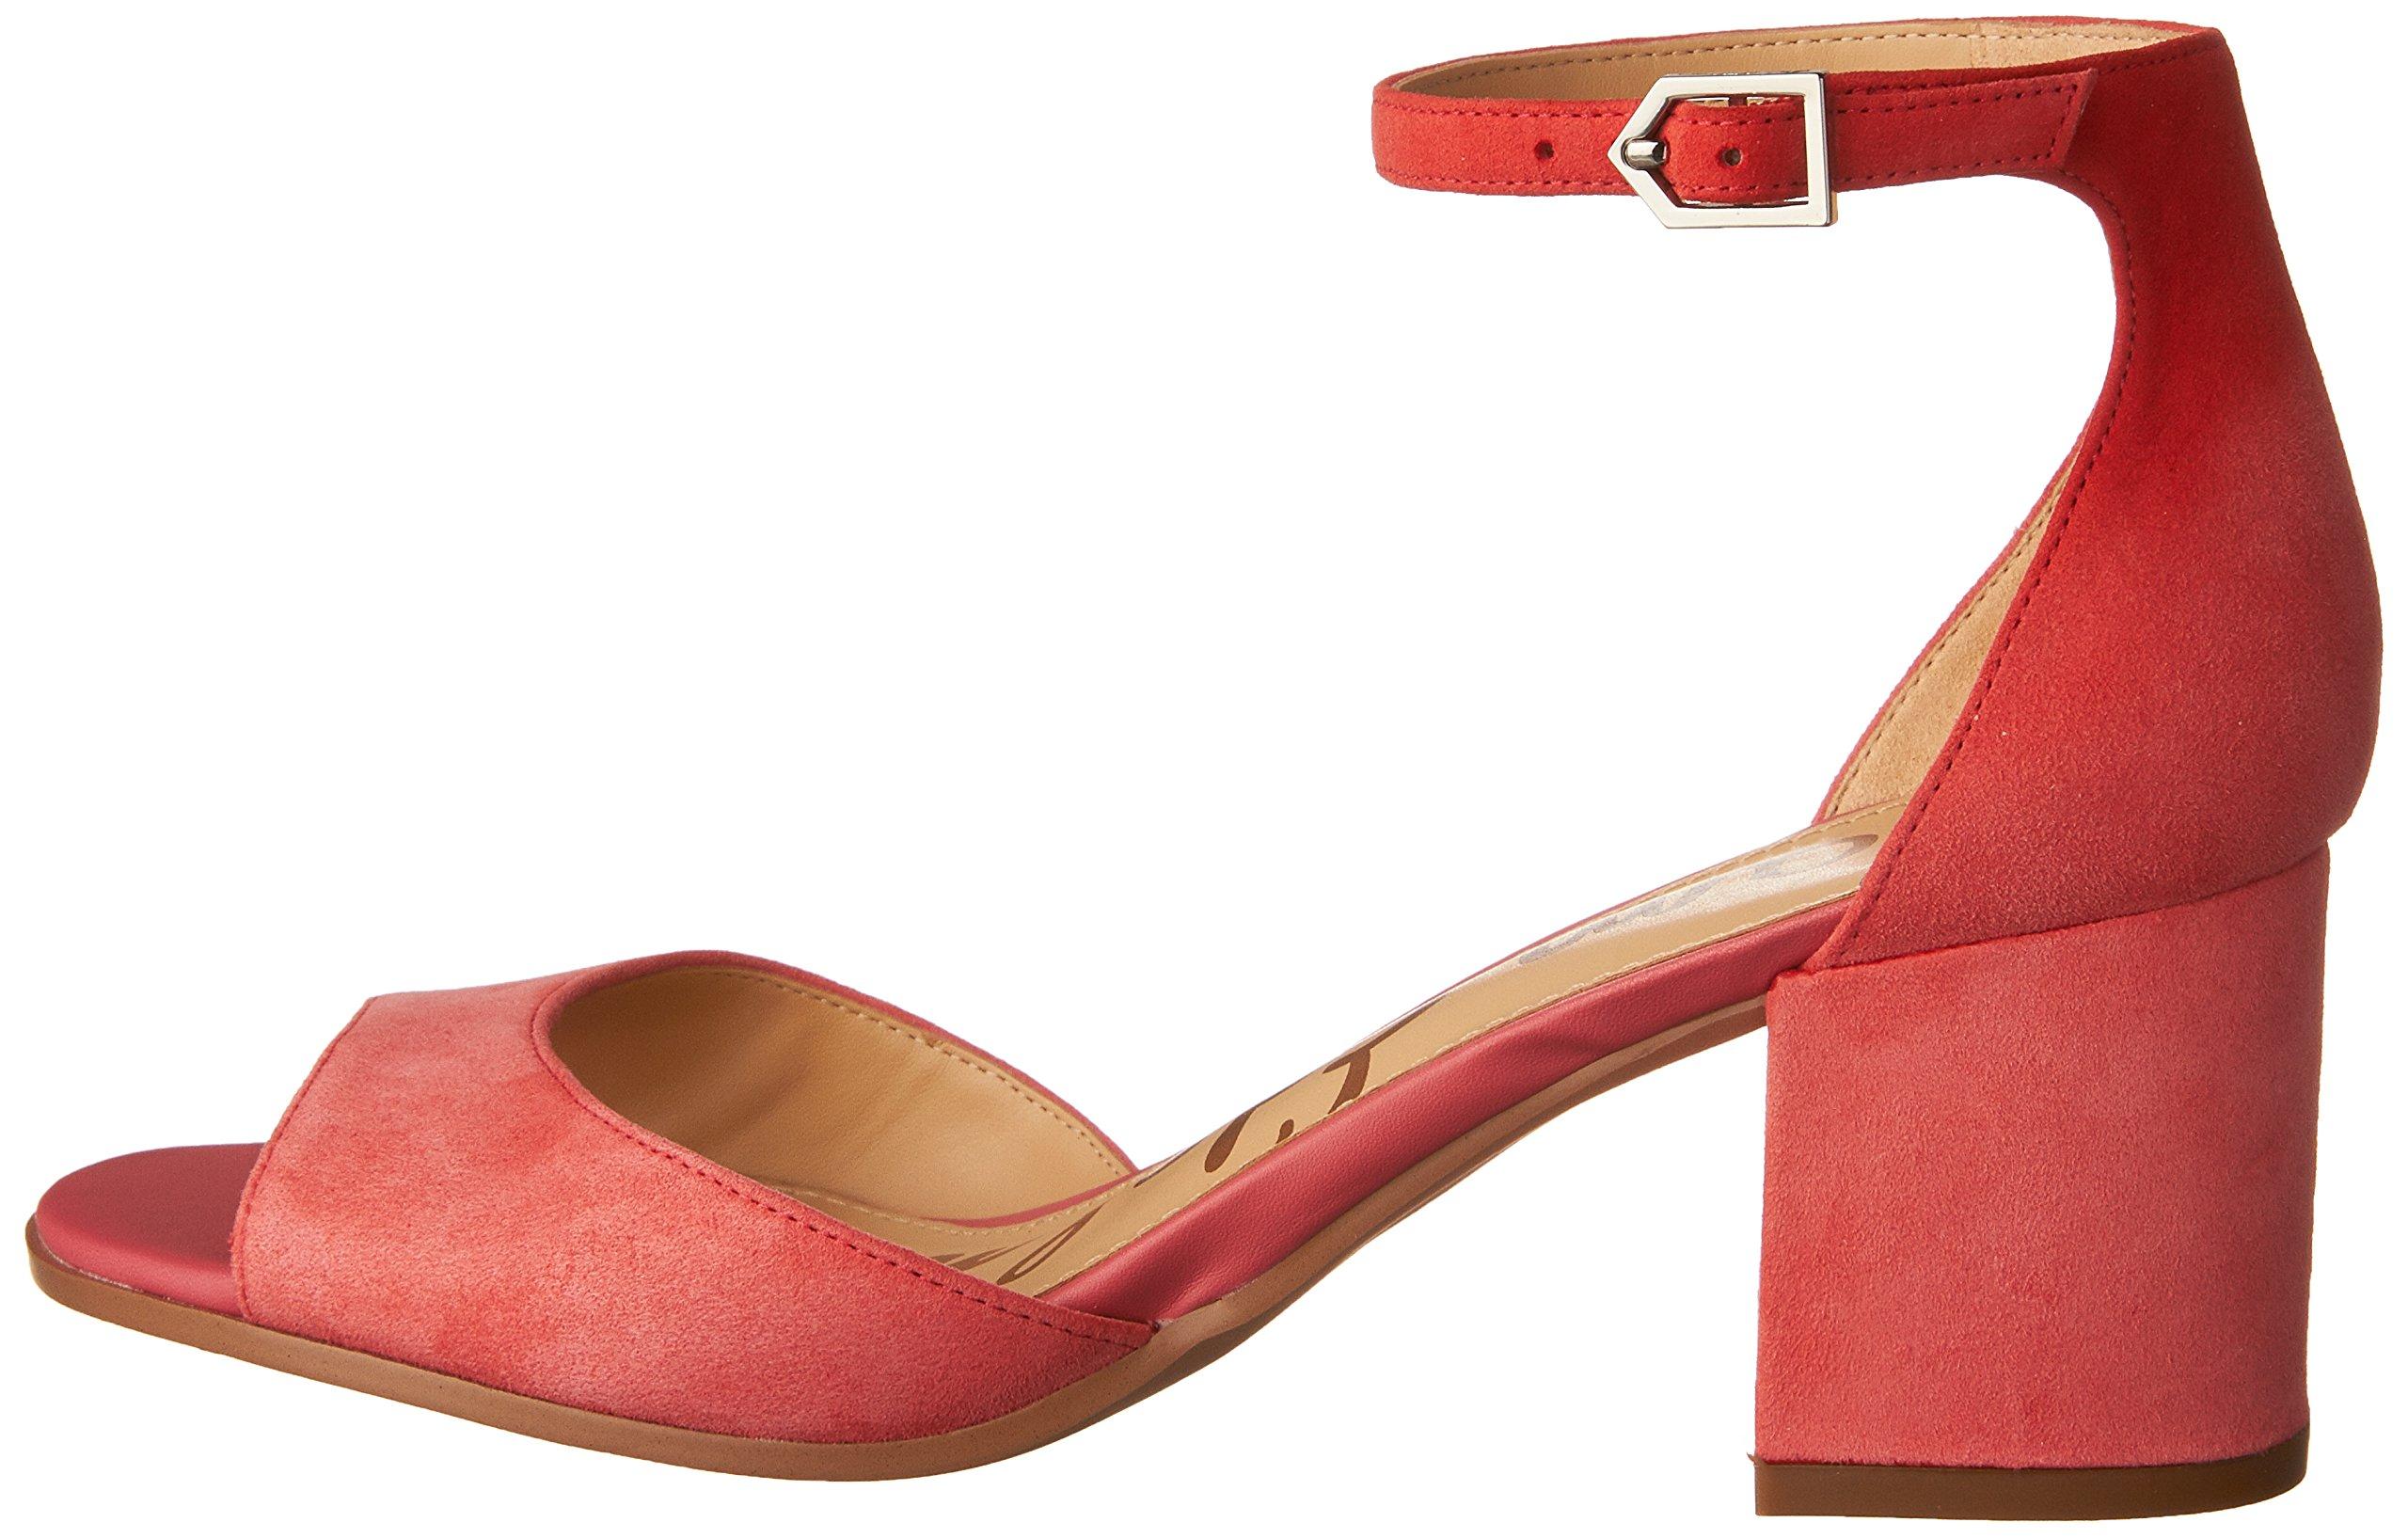 a492023f4c4 Sam Edelman Women s Susie Dress Sandal - E4727L1001   Flip-Flops ...